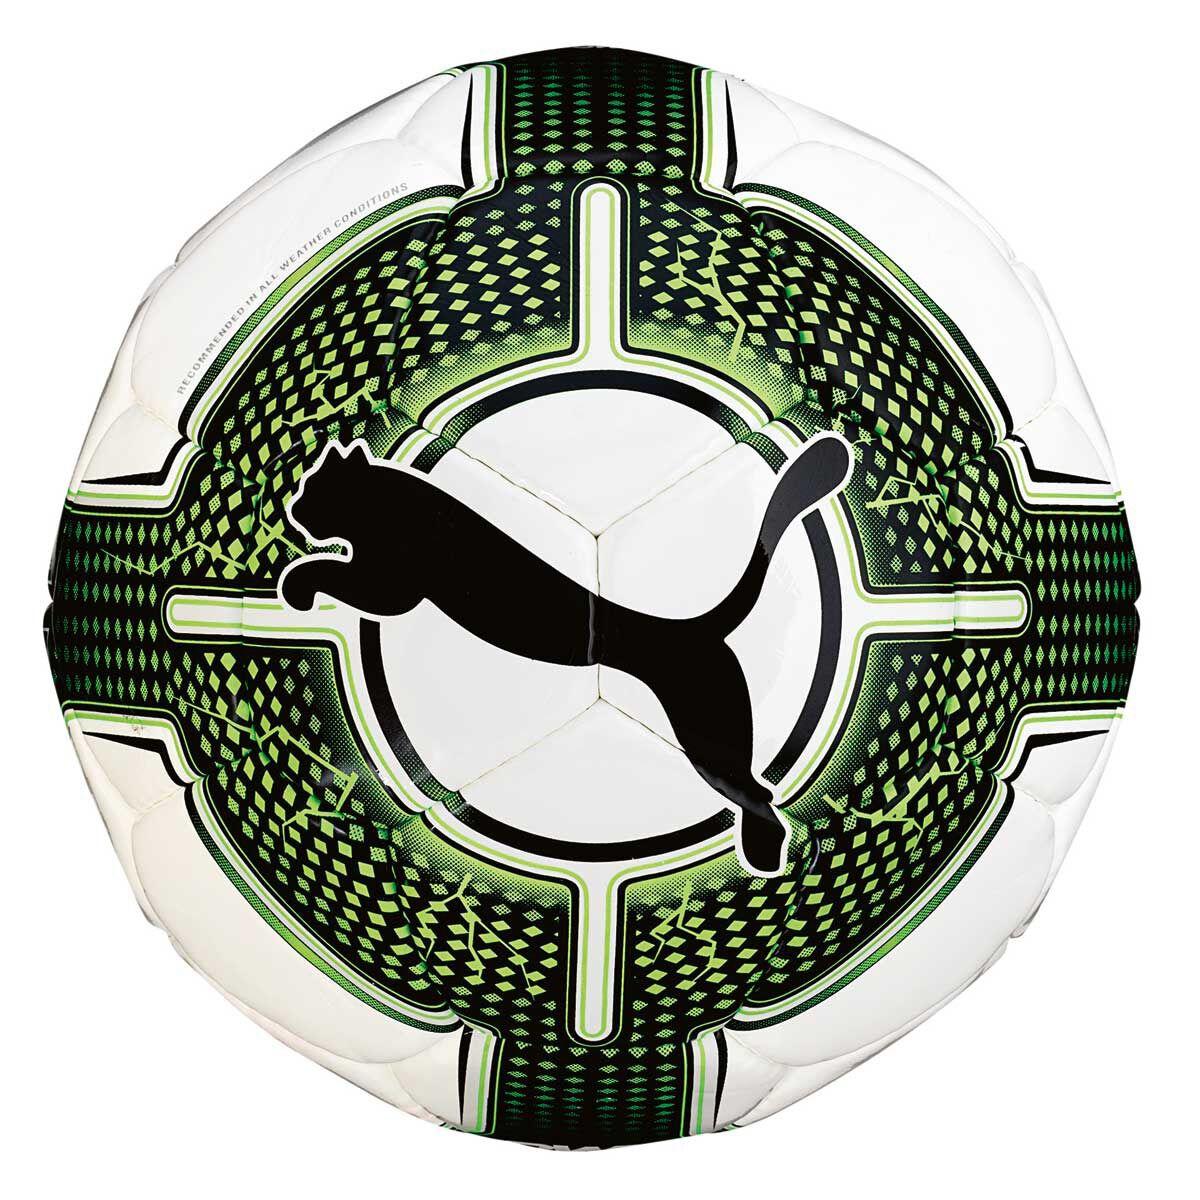 puma evopower soccer ball